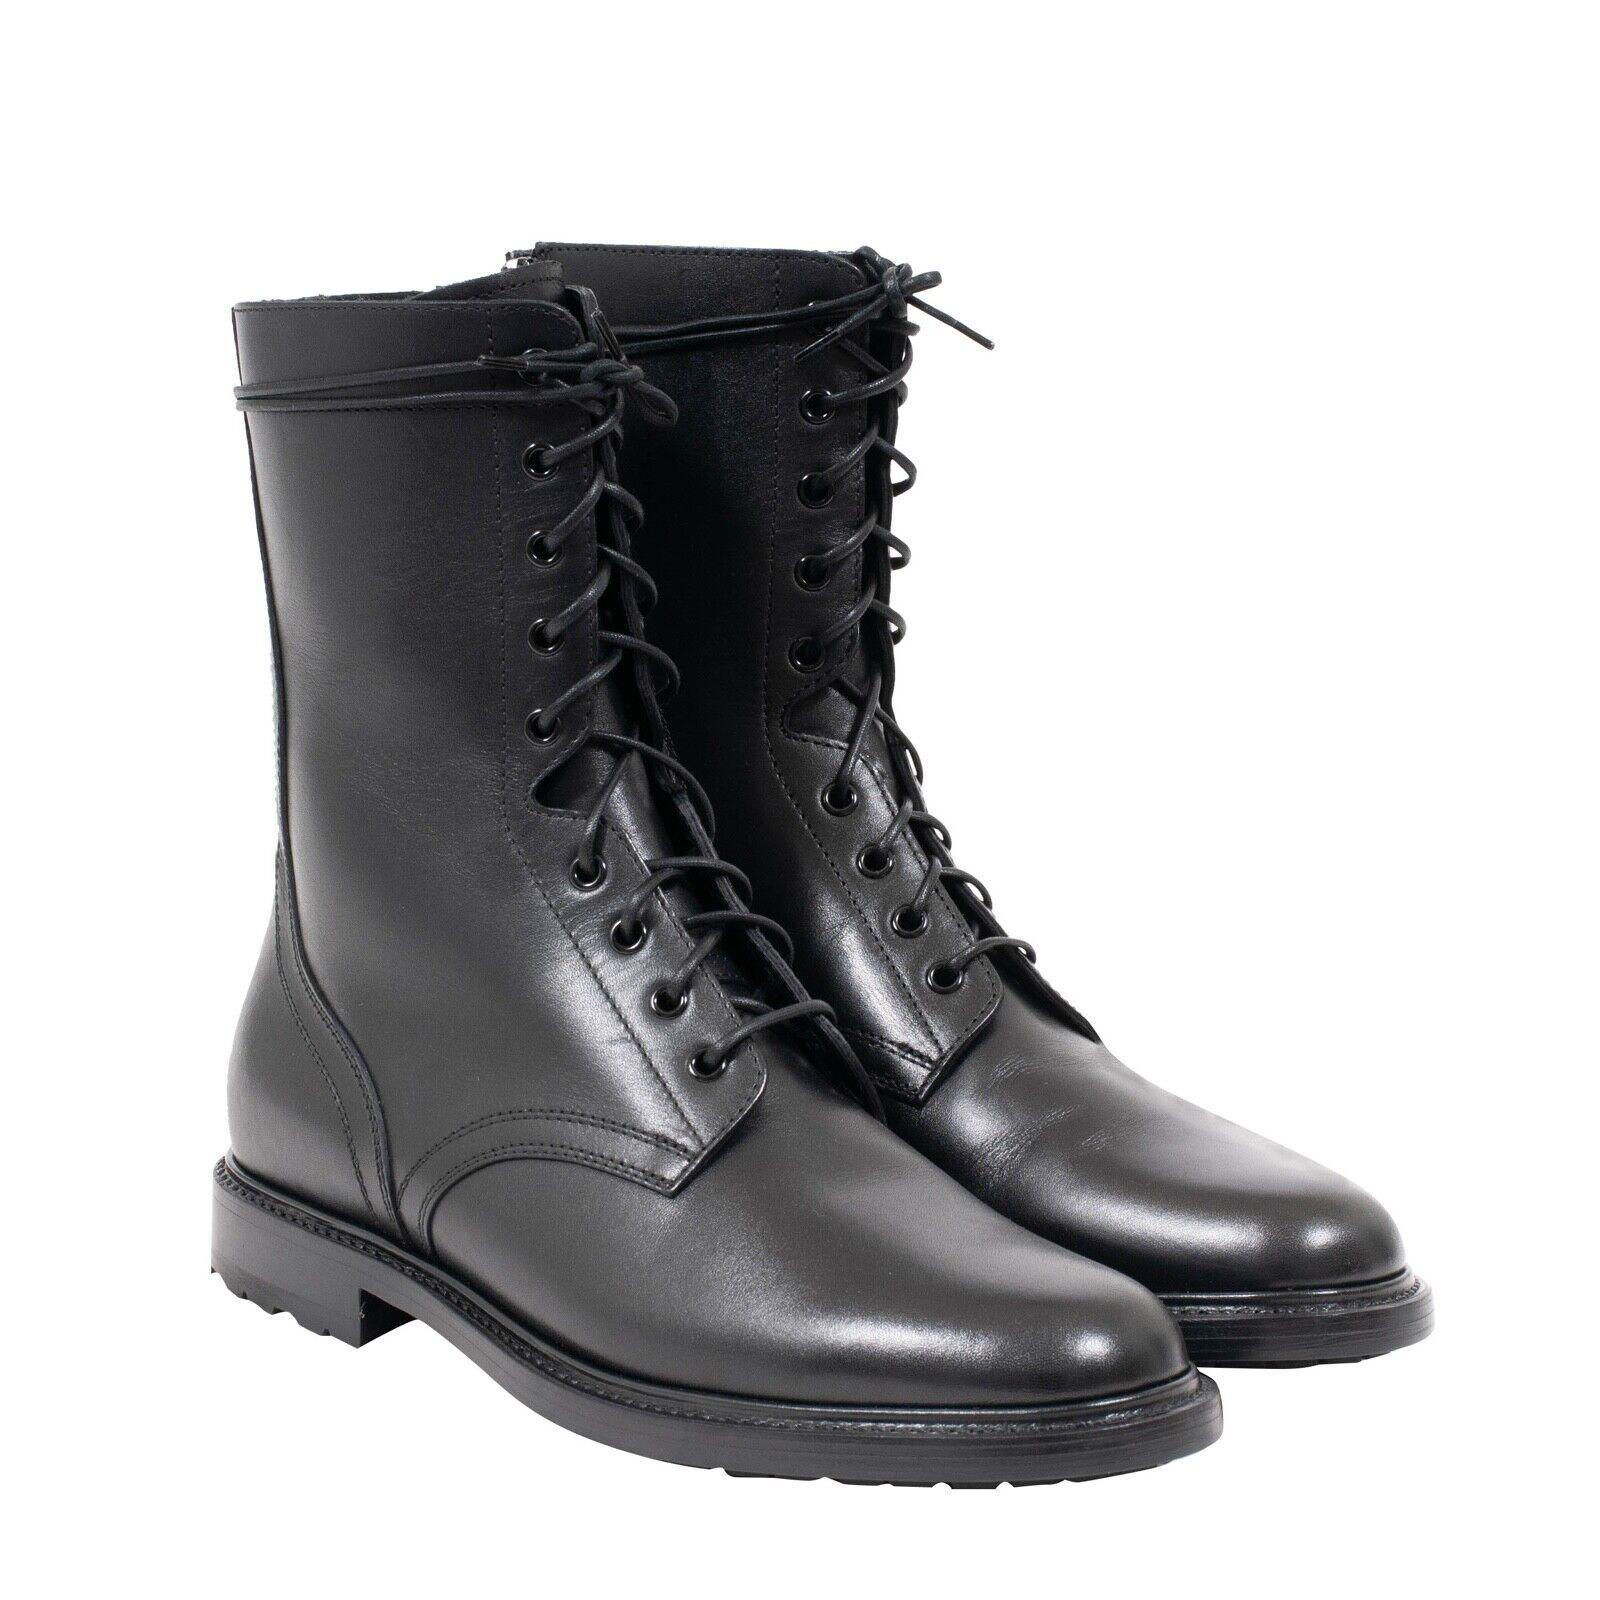 Celine Hedi Black Leather Side Zip Ranger Combat Boots Size 45-EU USA-12